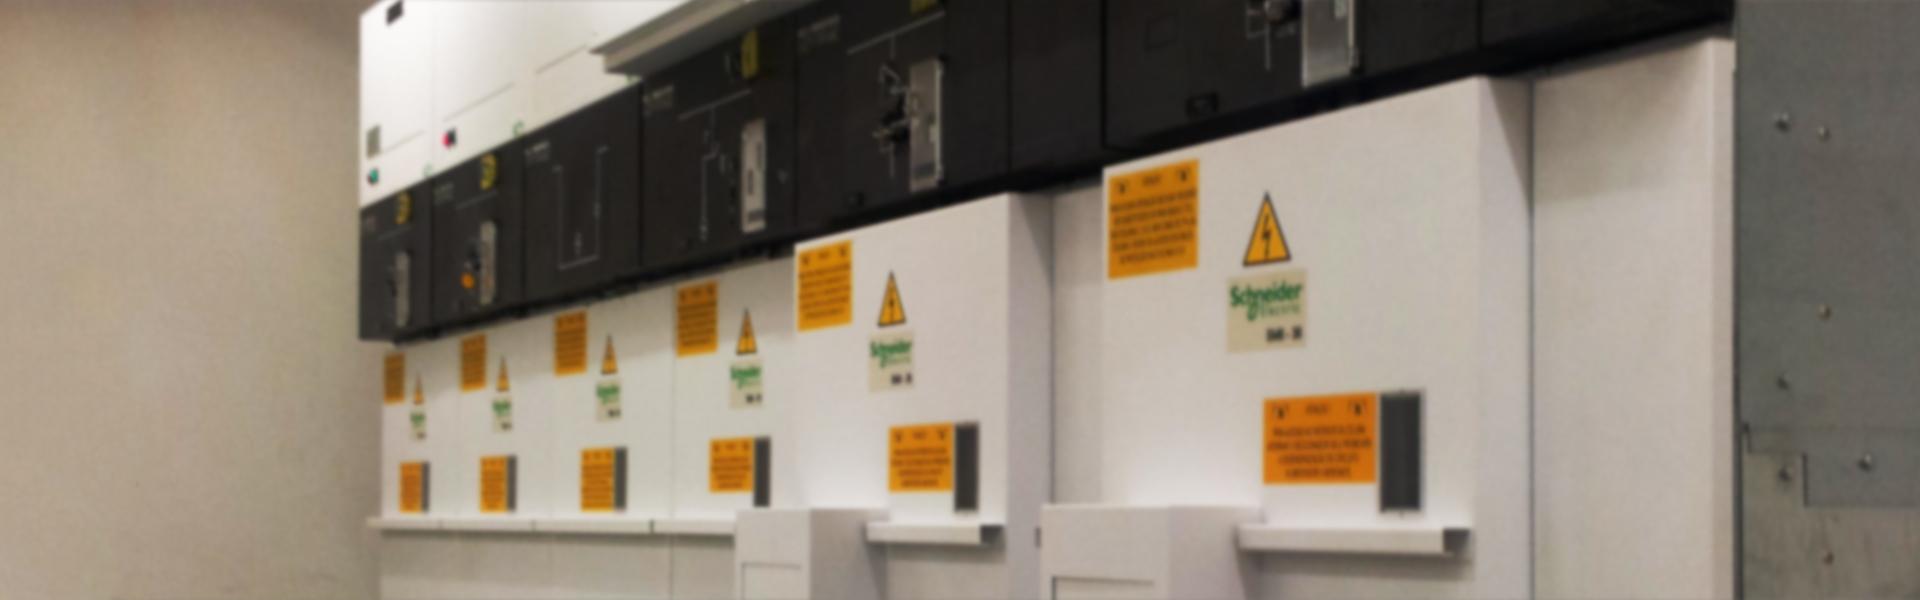 instalacoes-eletricas-banner-3